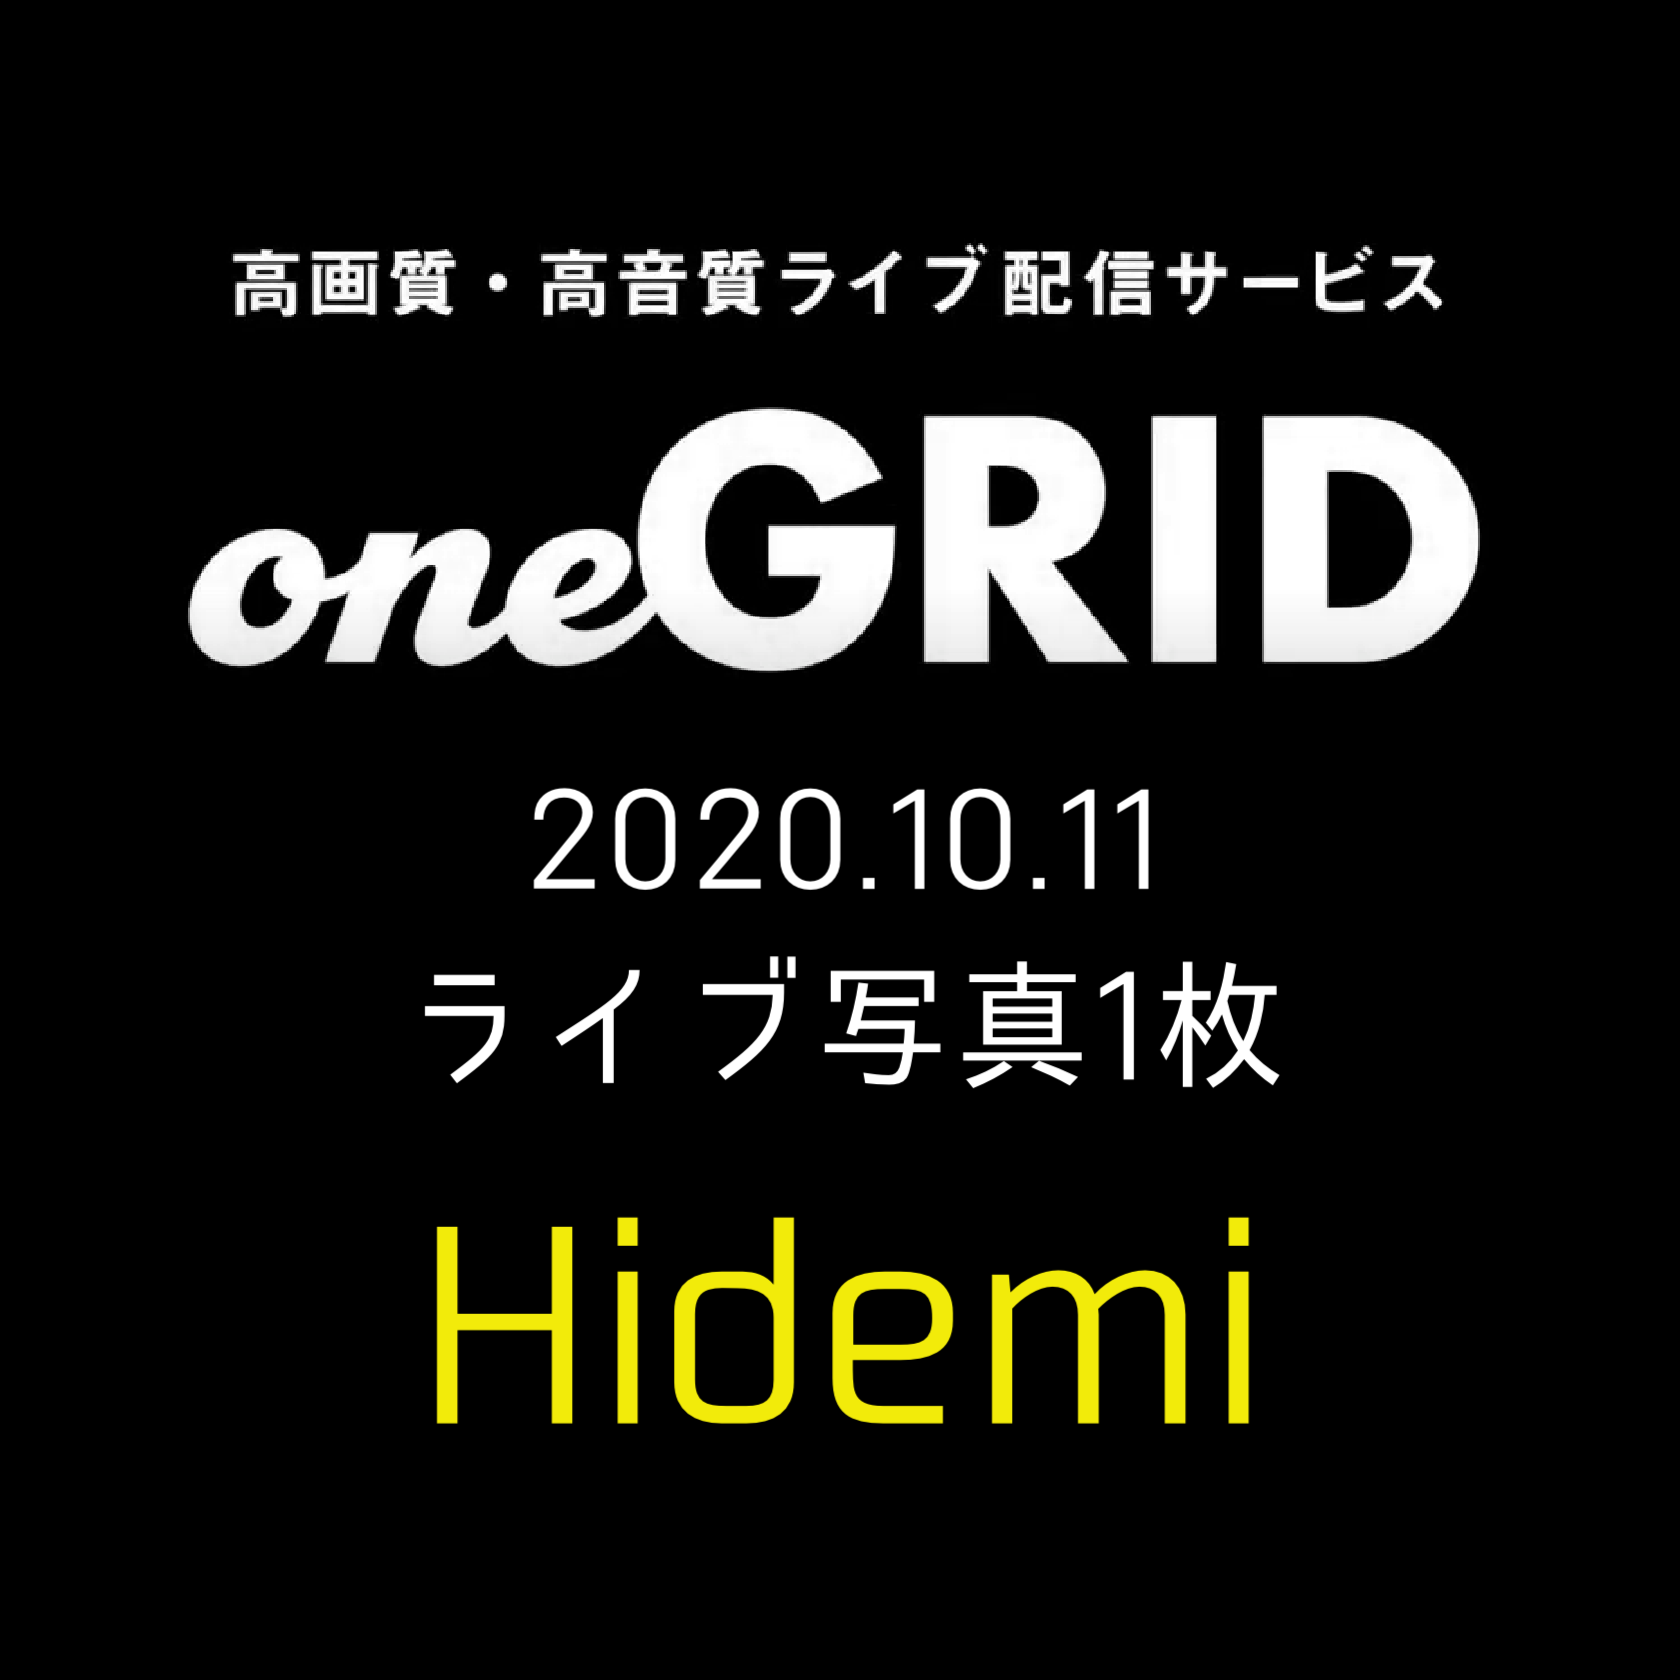 10/11 Hidemi ライブ写真